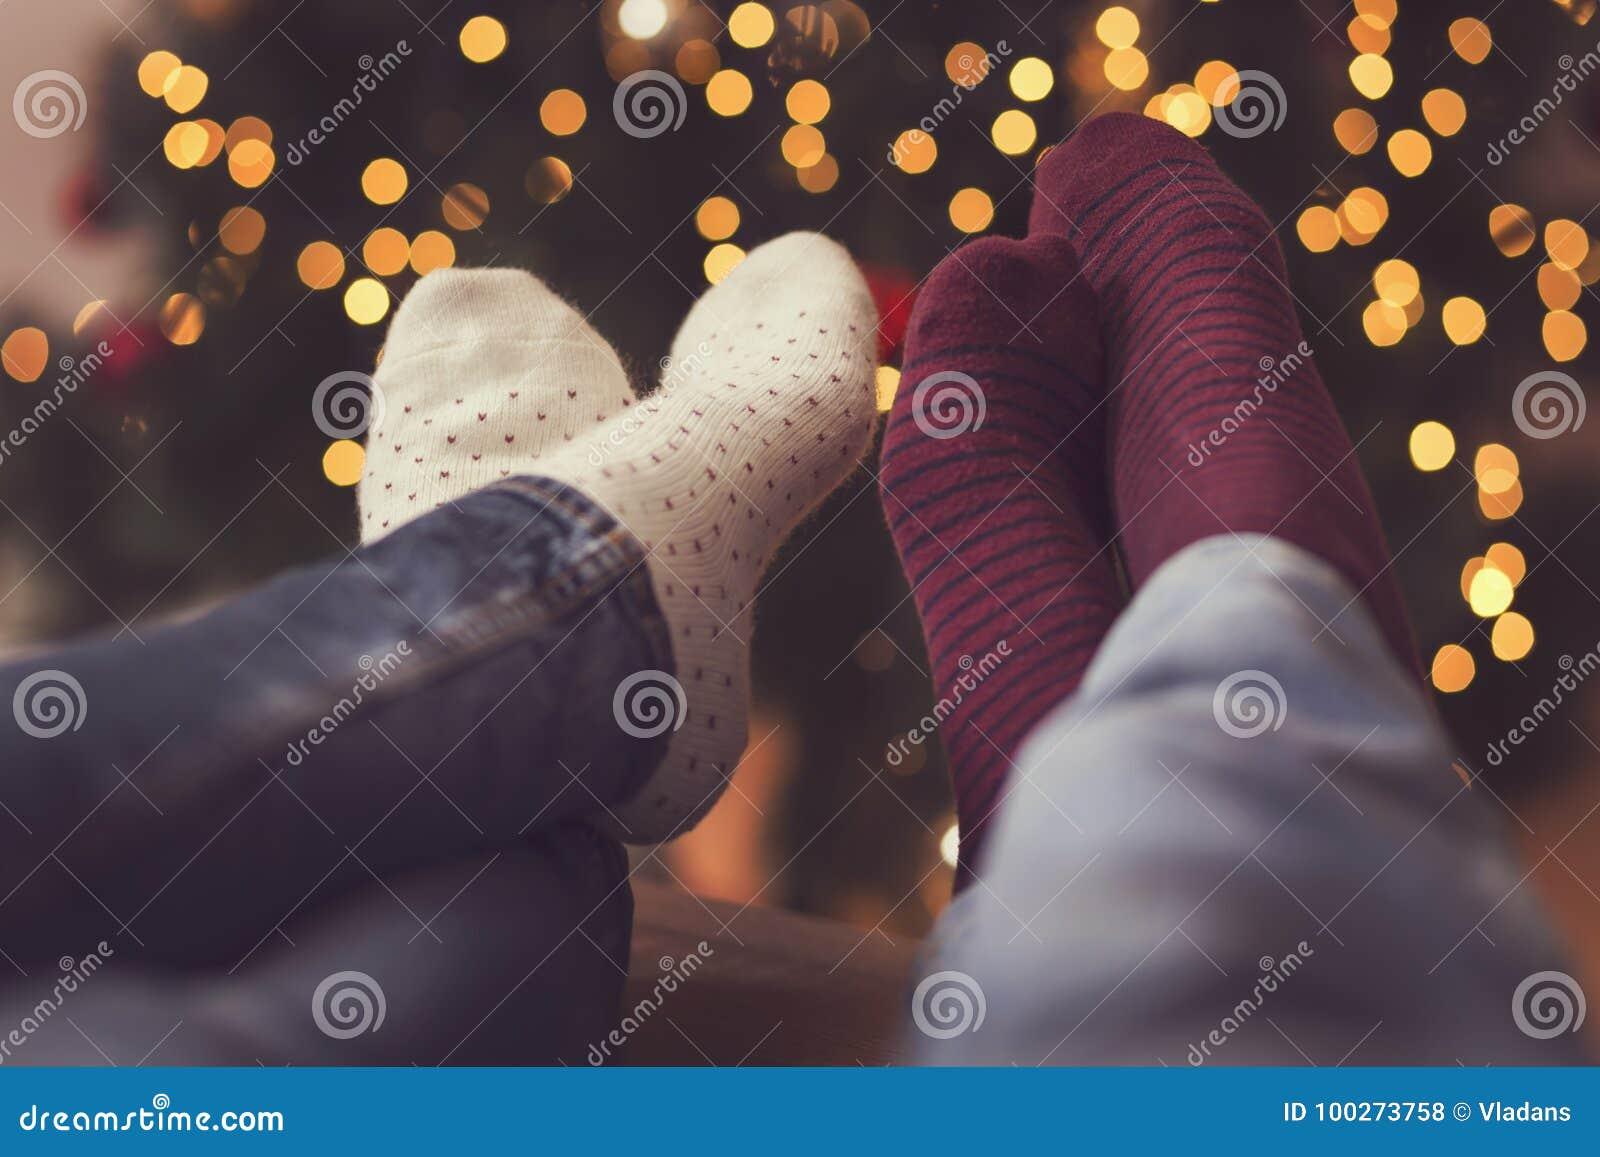 9326fc953a3 Couple enjoying Christmas stock photo. Image of girlfriend - 100273758